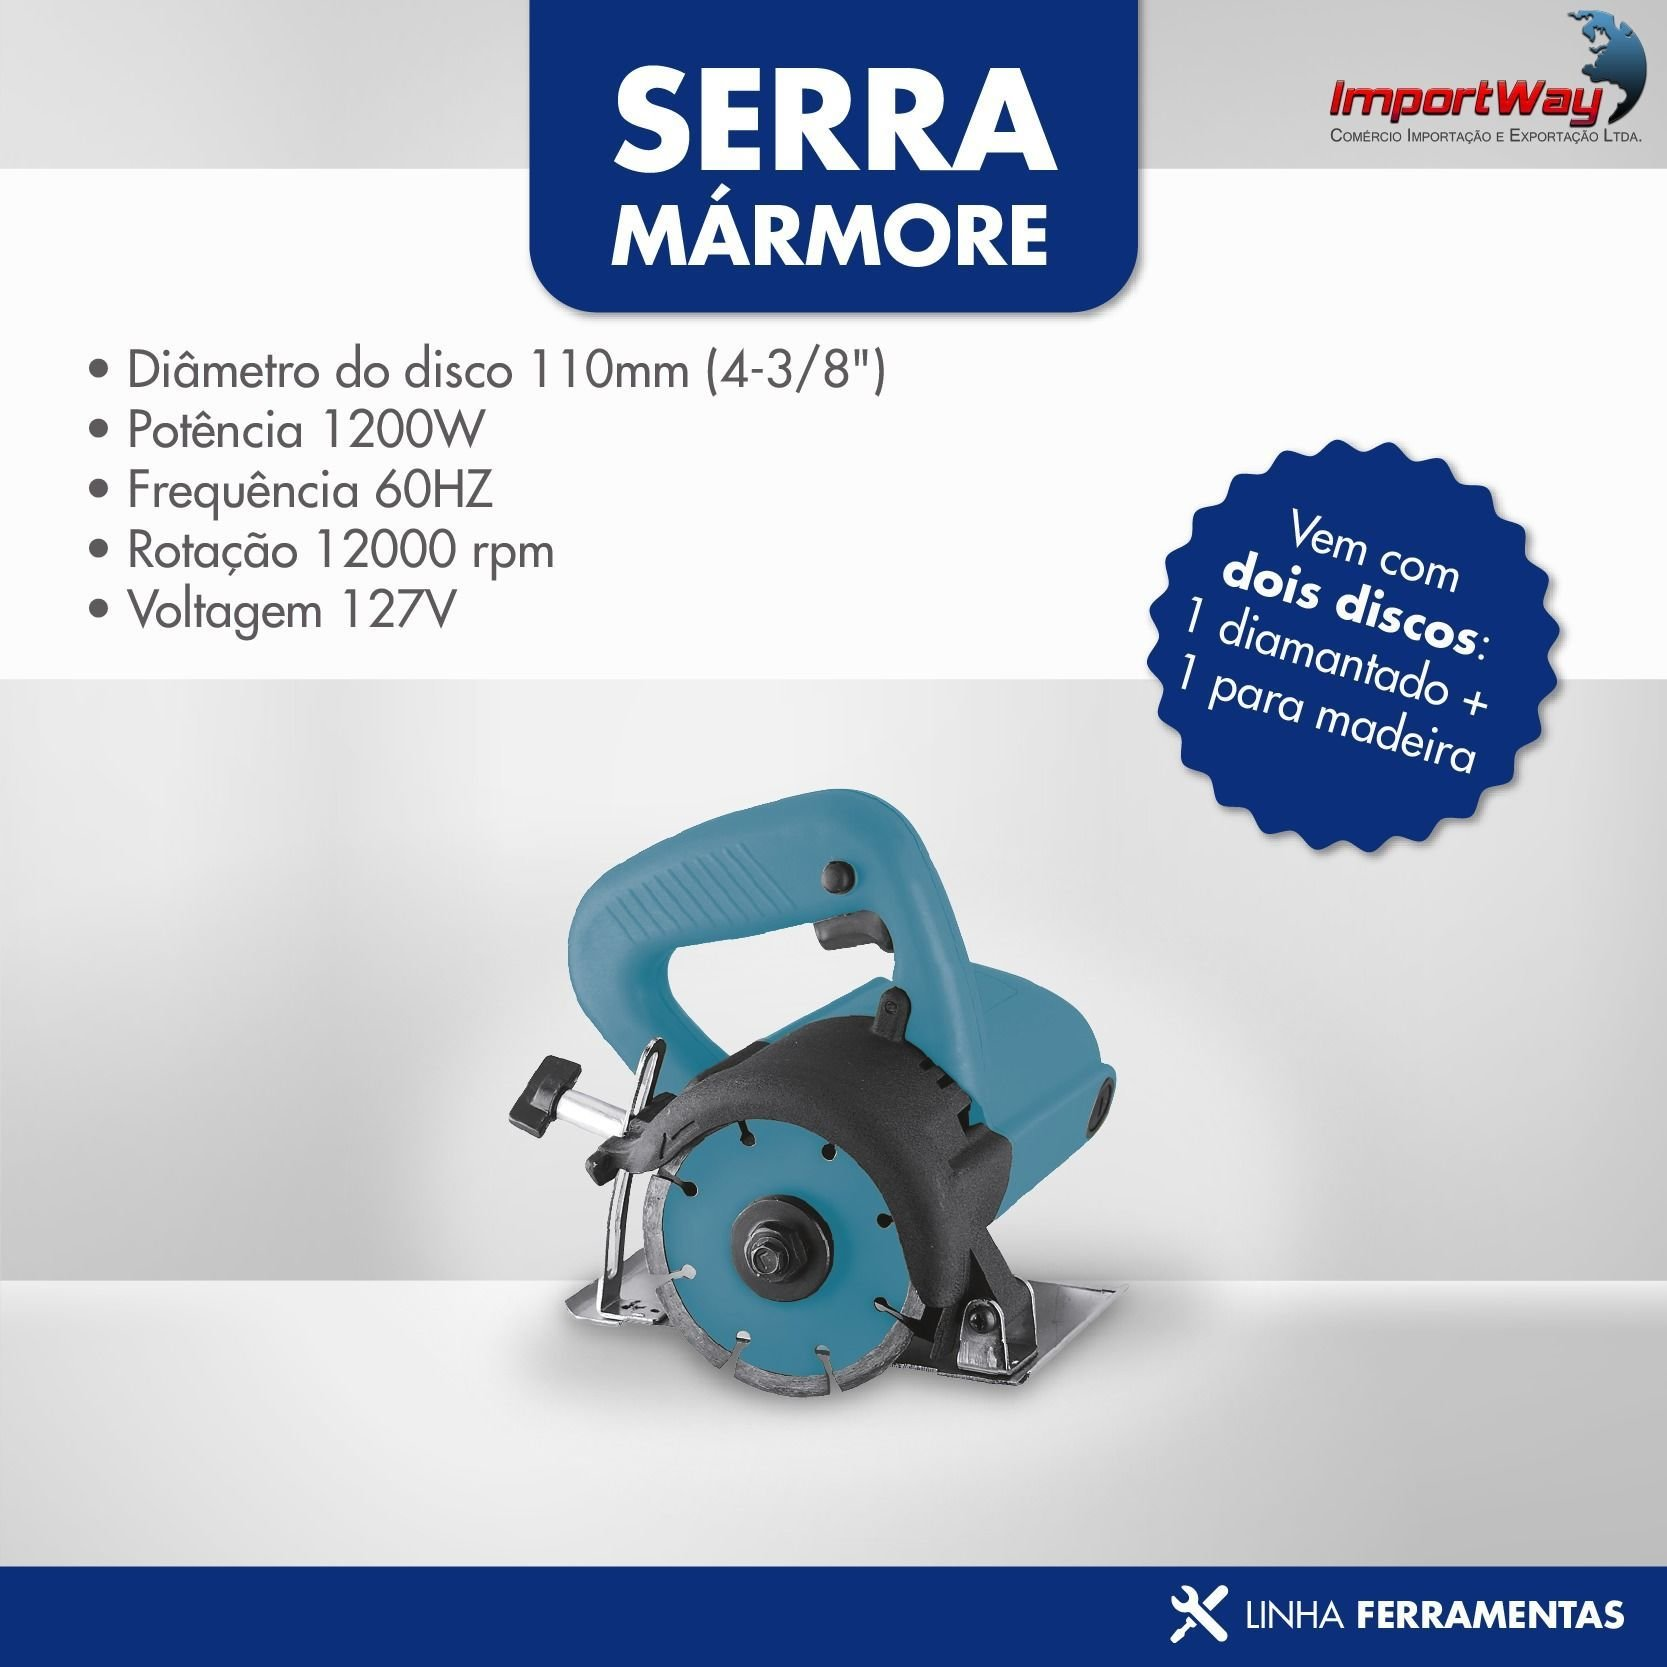 Serra Mármore Tipo Makita 1200w 110v com 2 Discos Brinde - Importway